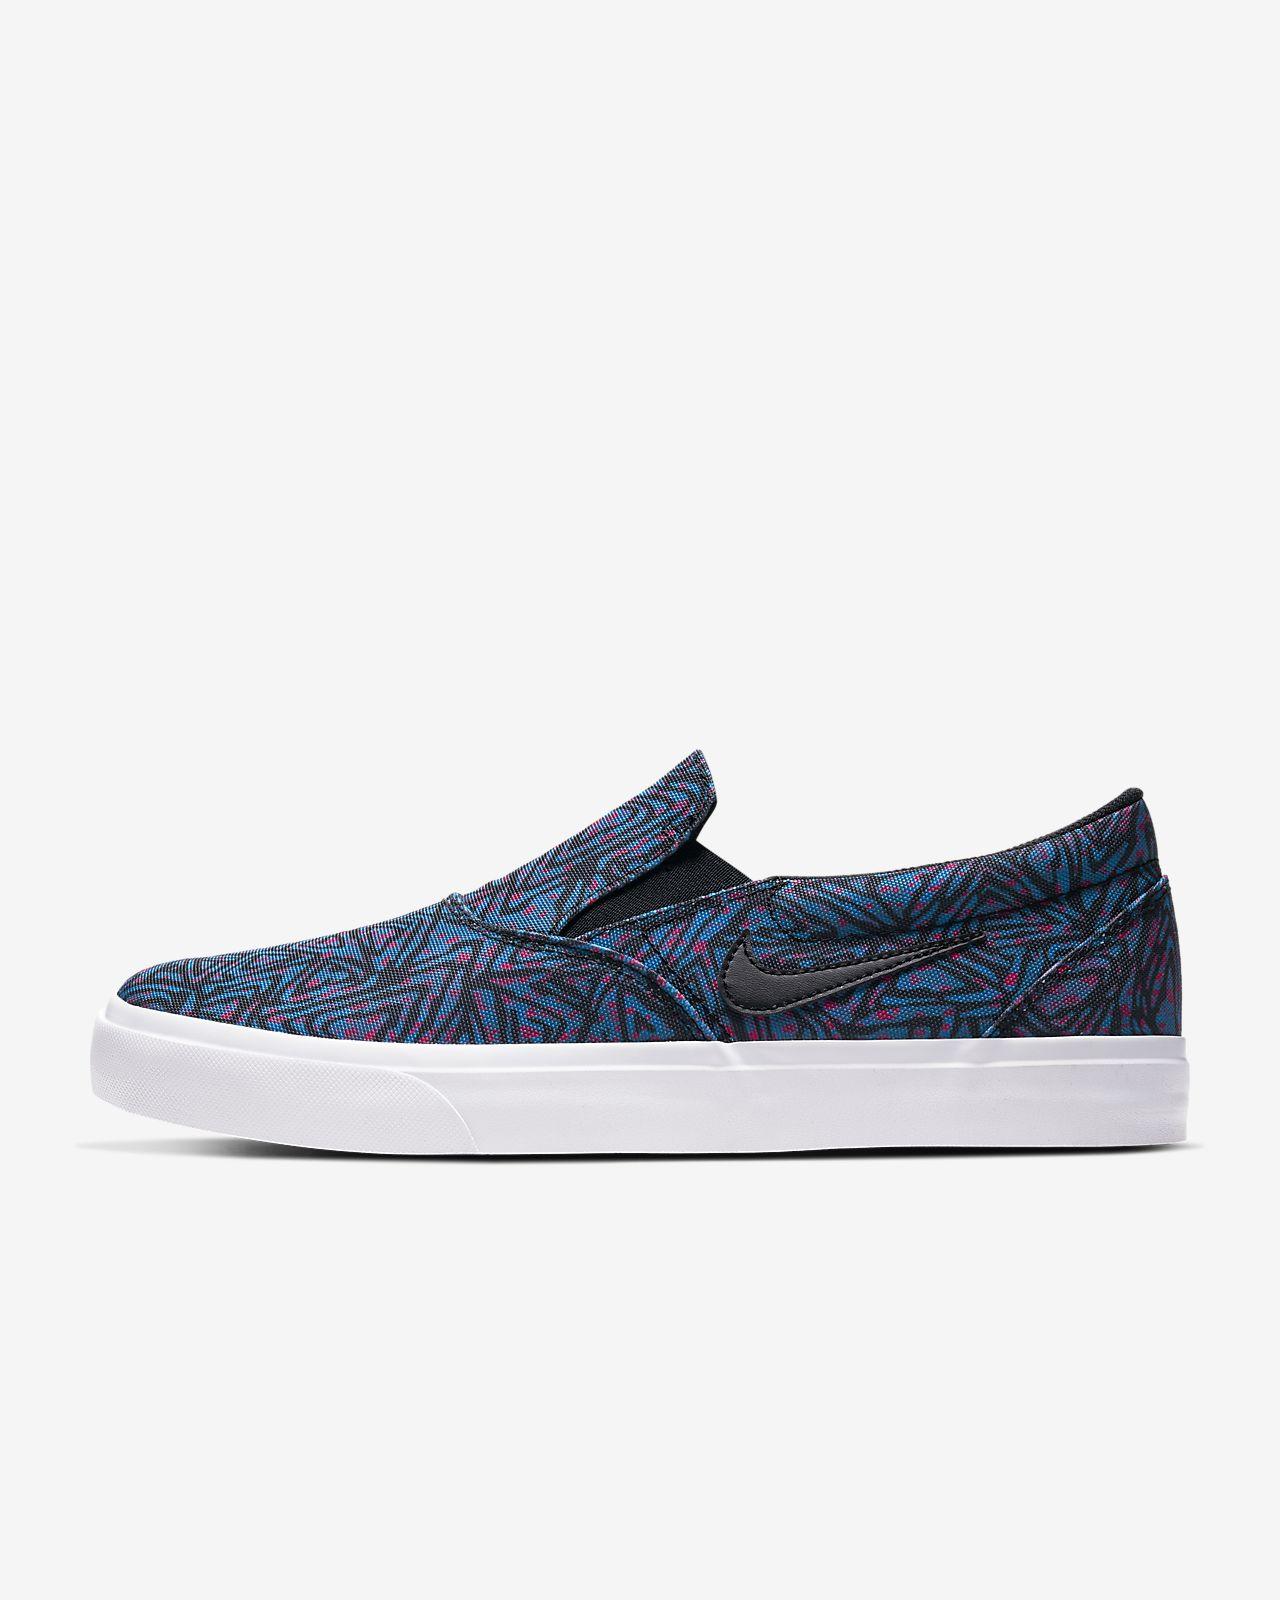 Nike SB Charge Slip Premium Skate Shoe